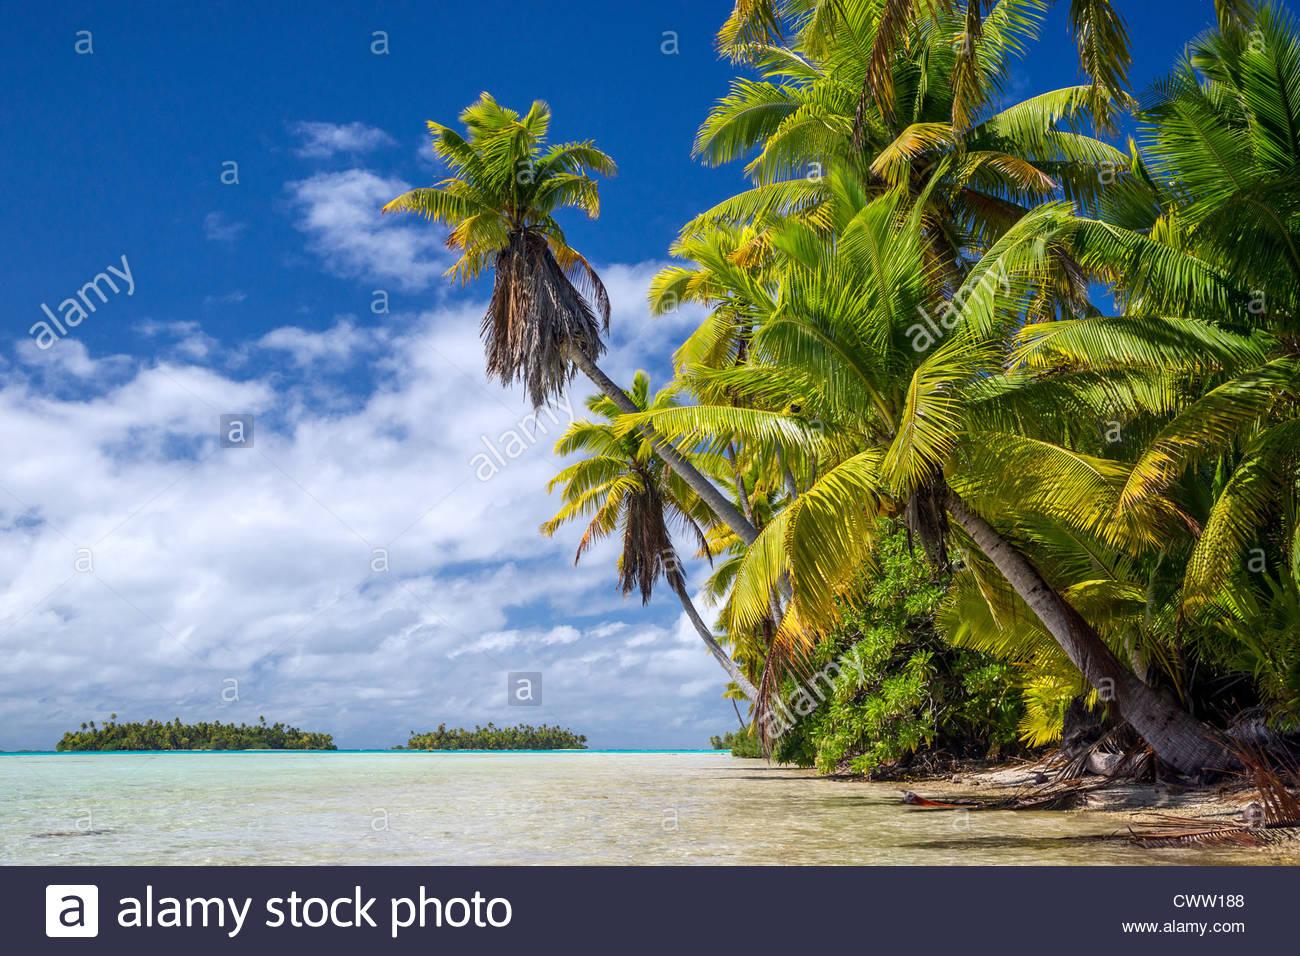 Rangiroa (Tuamotu archipelago - French Polynesia) : the blue lagoon - Stock Image